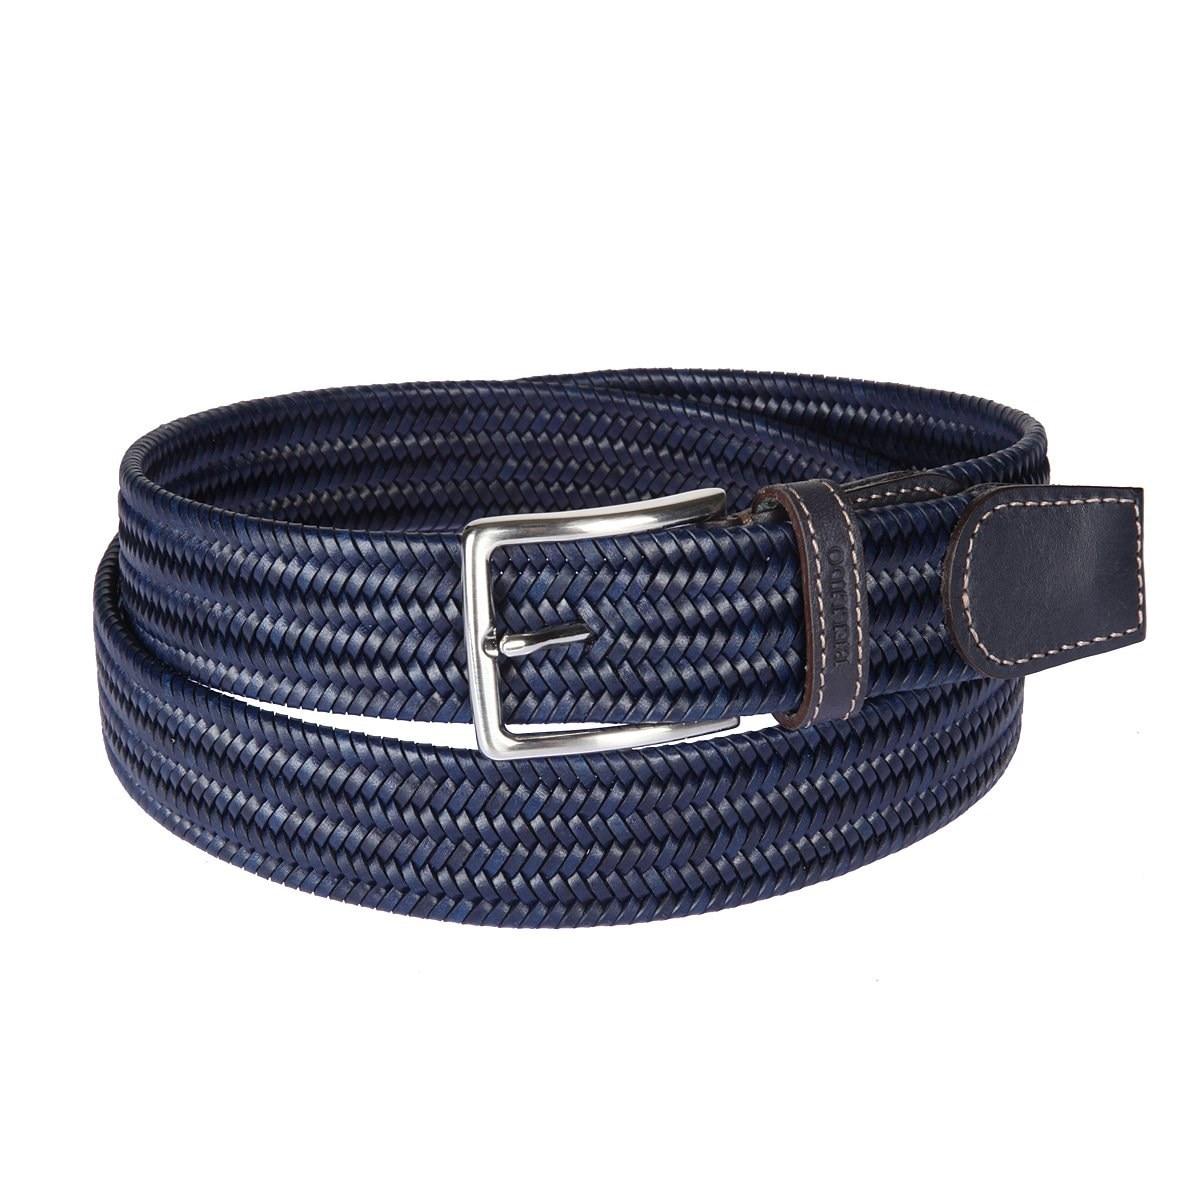 Фото - Belt Miguel Bellido 935/35 2341/12 navy blue active cut out elastic vest in navy